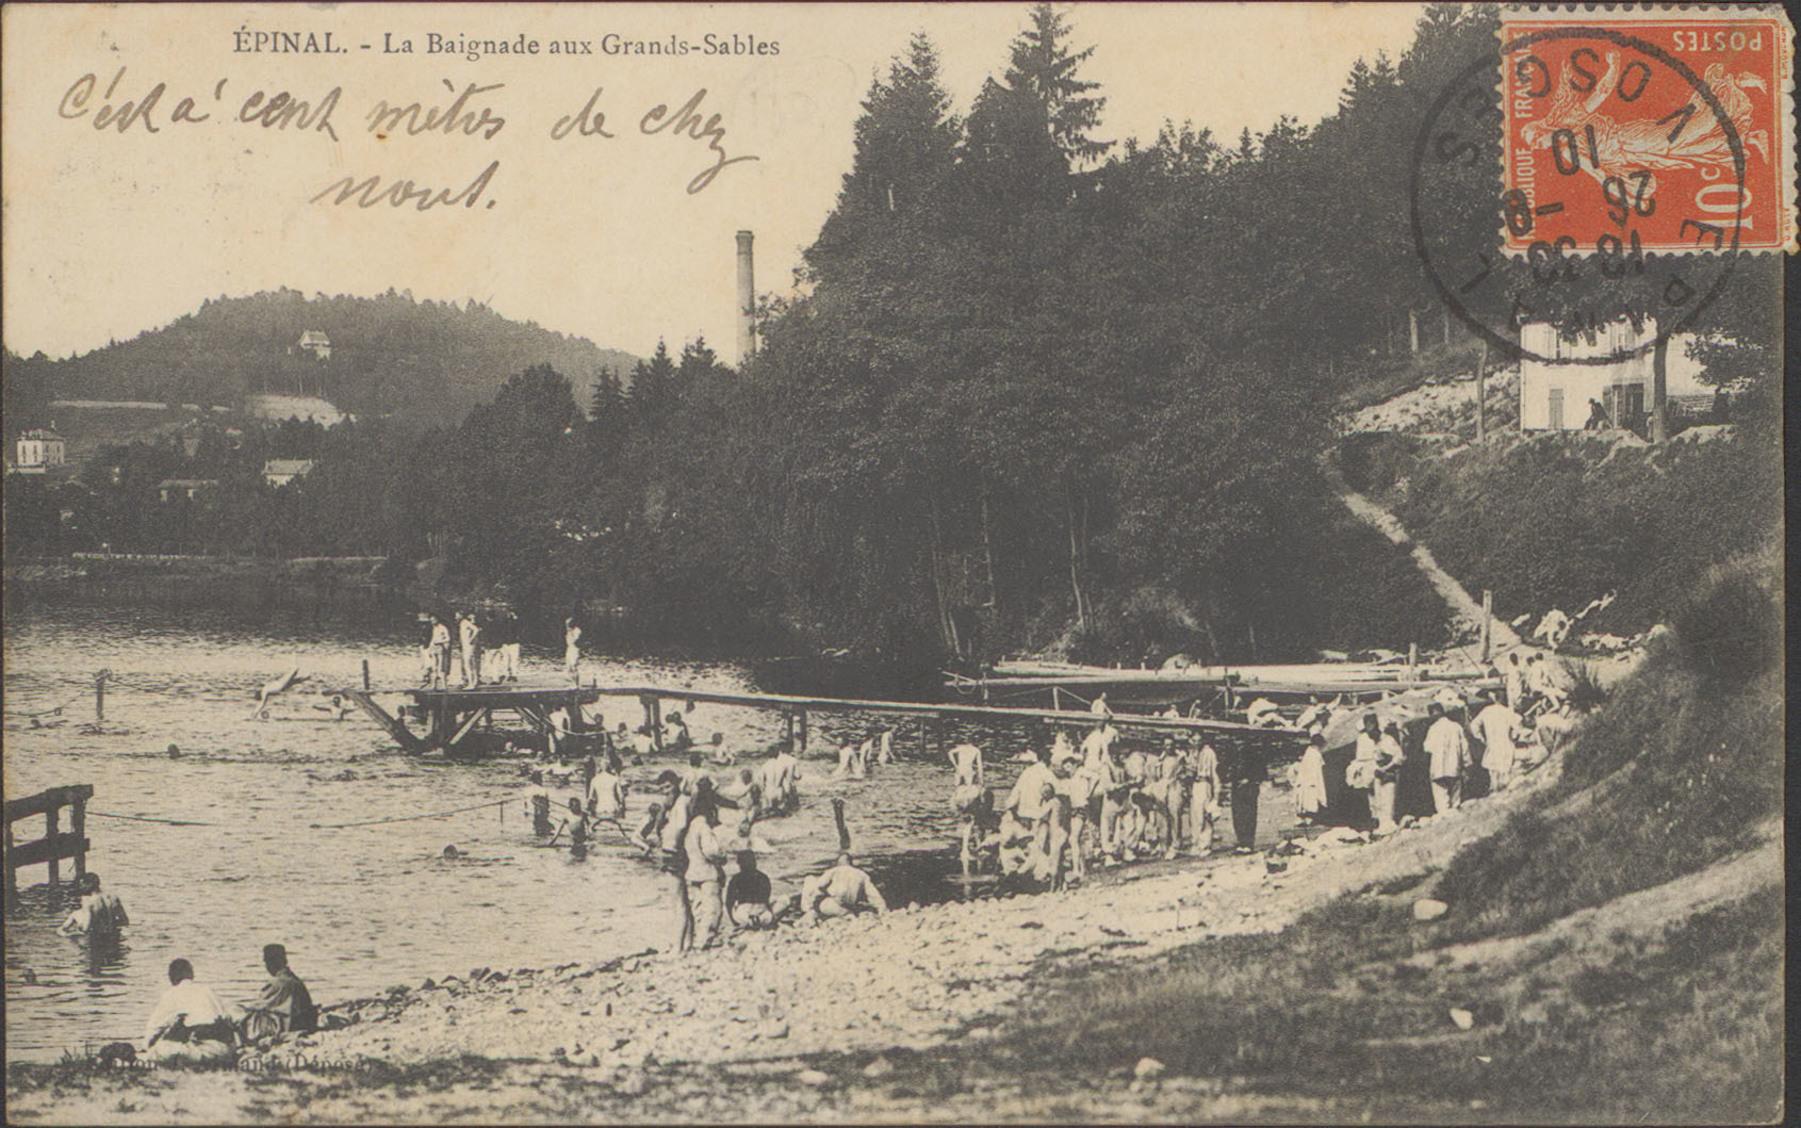 Contenu du Épinal, La Baignade aux Grands-Sables